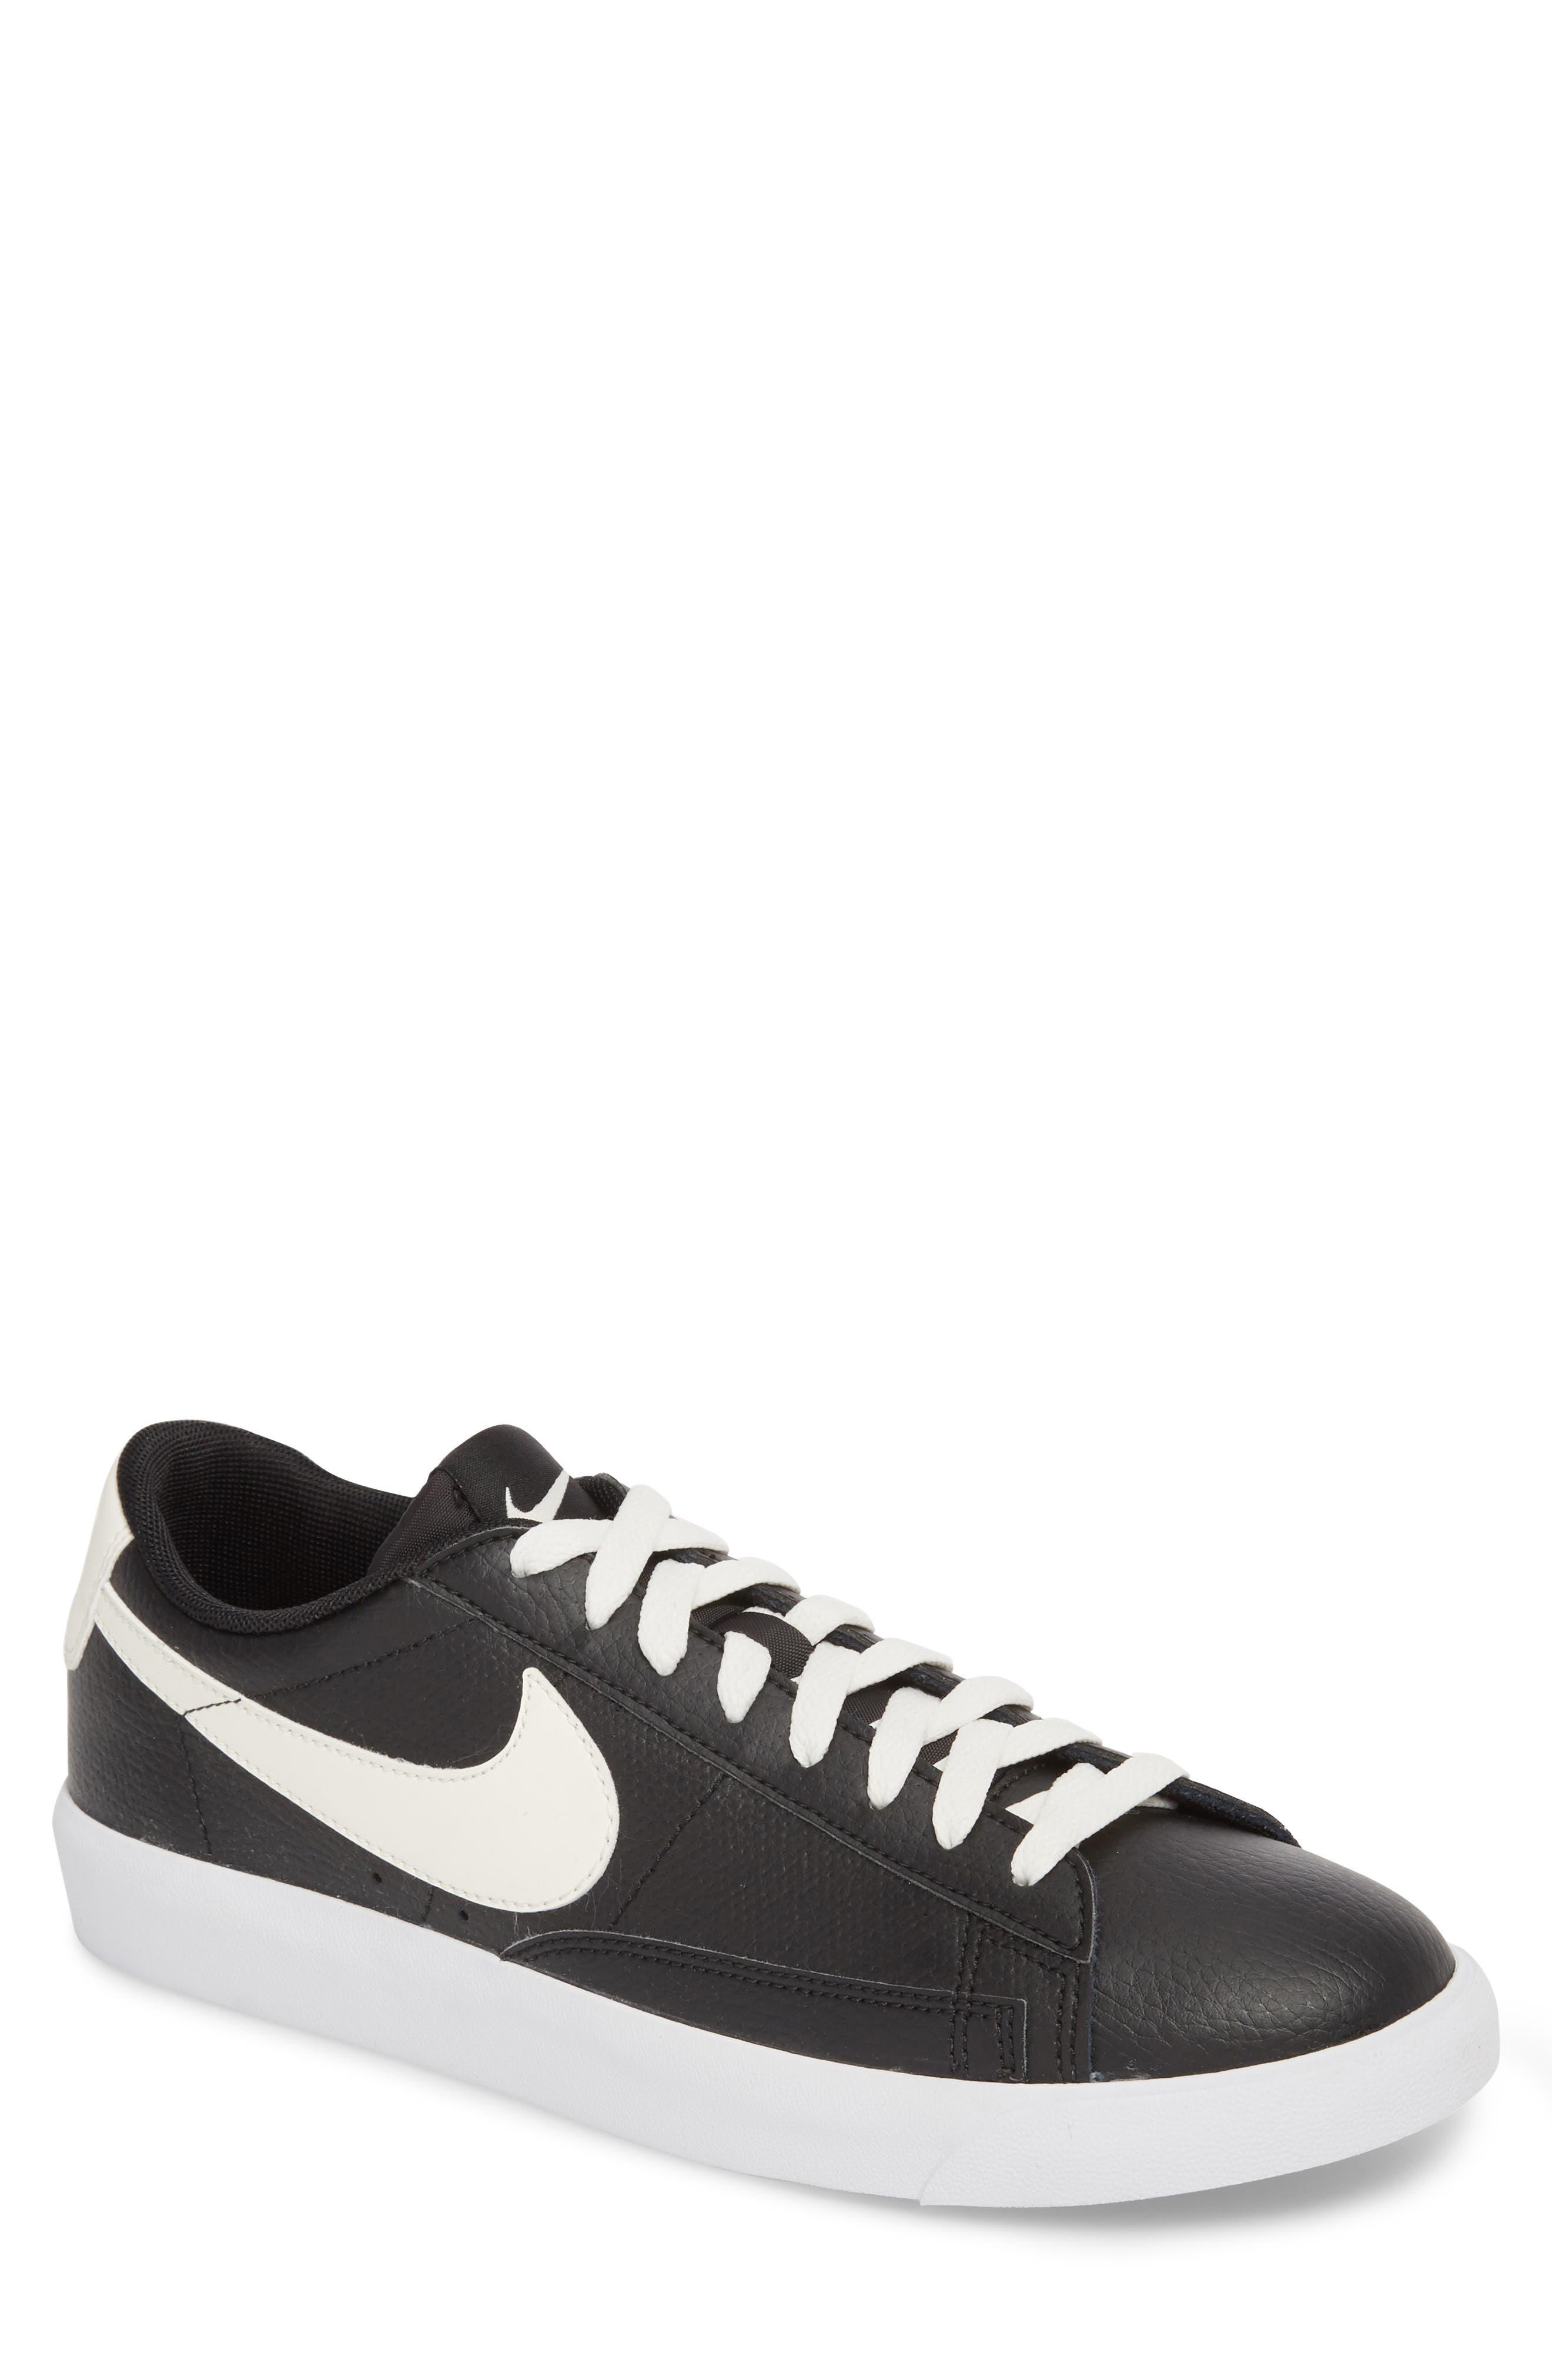 Blazer Low Leather Sneaker,                             Main thumbnail 1, color,                             Black/ Sail